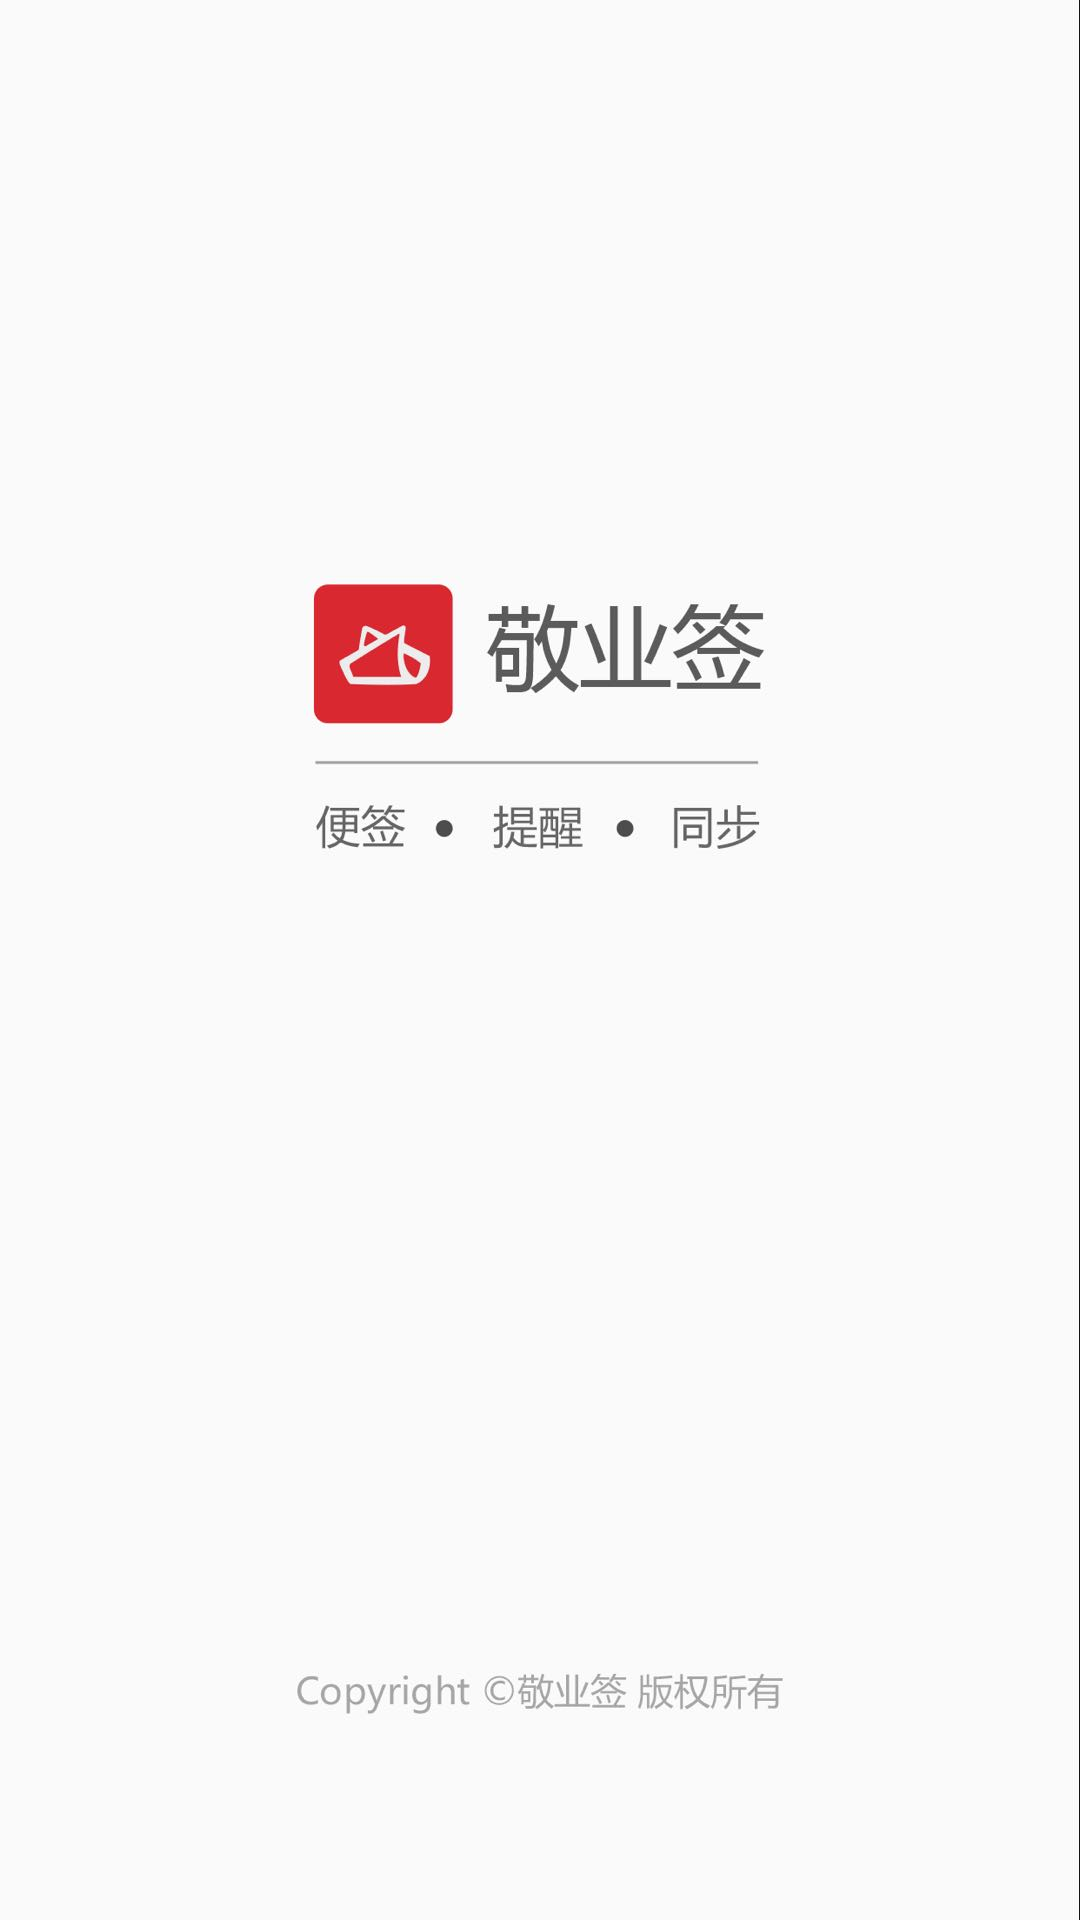 oppo手机有什么可以显示字数的便签app?